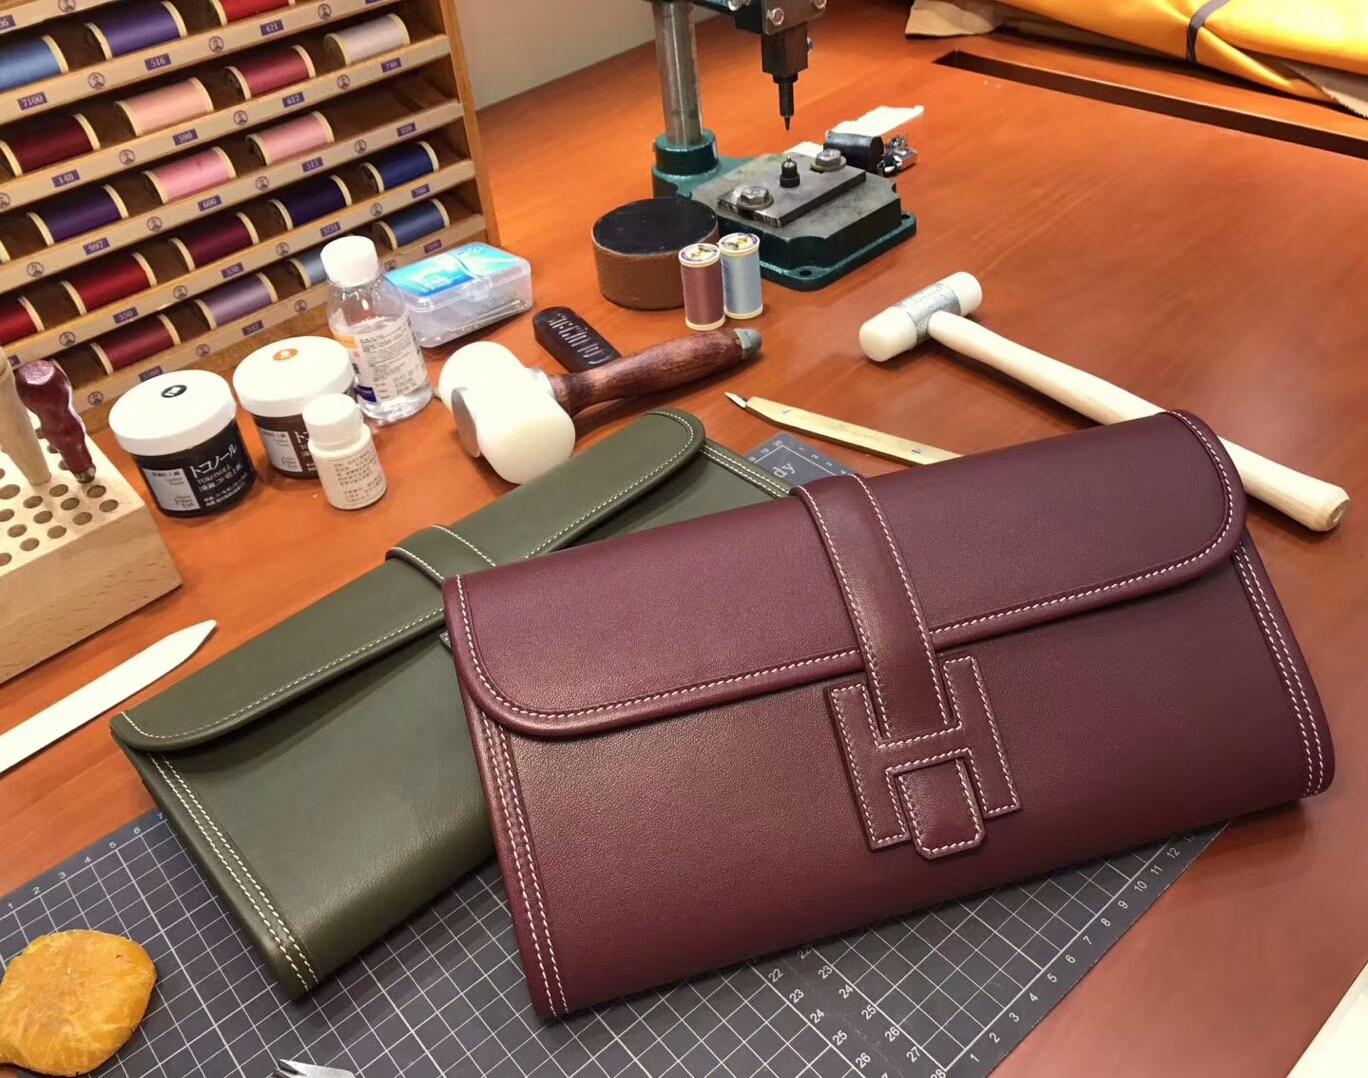 HERMES 爱马仕 手包 配全套专柜原版包装 全球发售 波尔多酒红 ck57 bordeaux